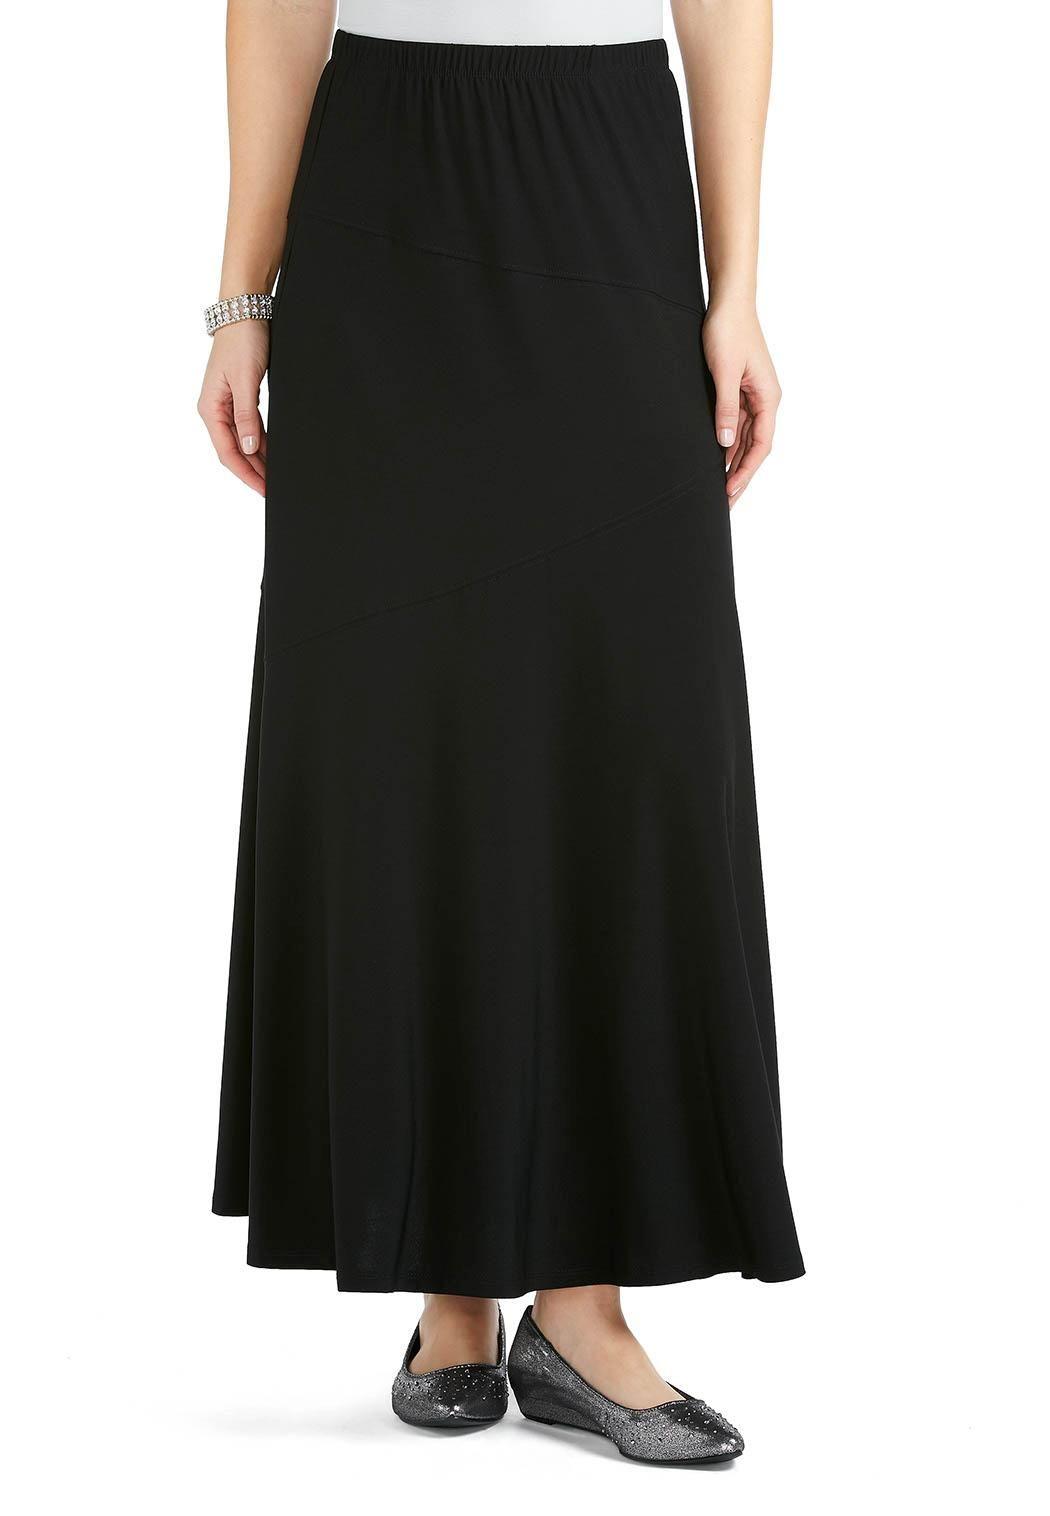 fd5dbe93d6a Zigzag Seam Maxi Skirt - Plus Skirts Cato Fashions